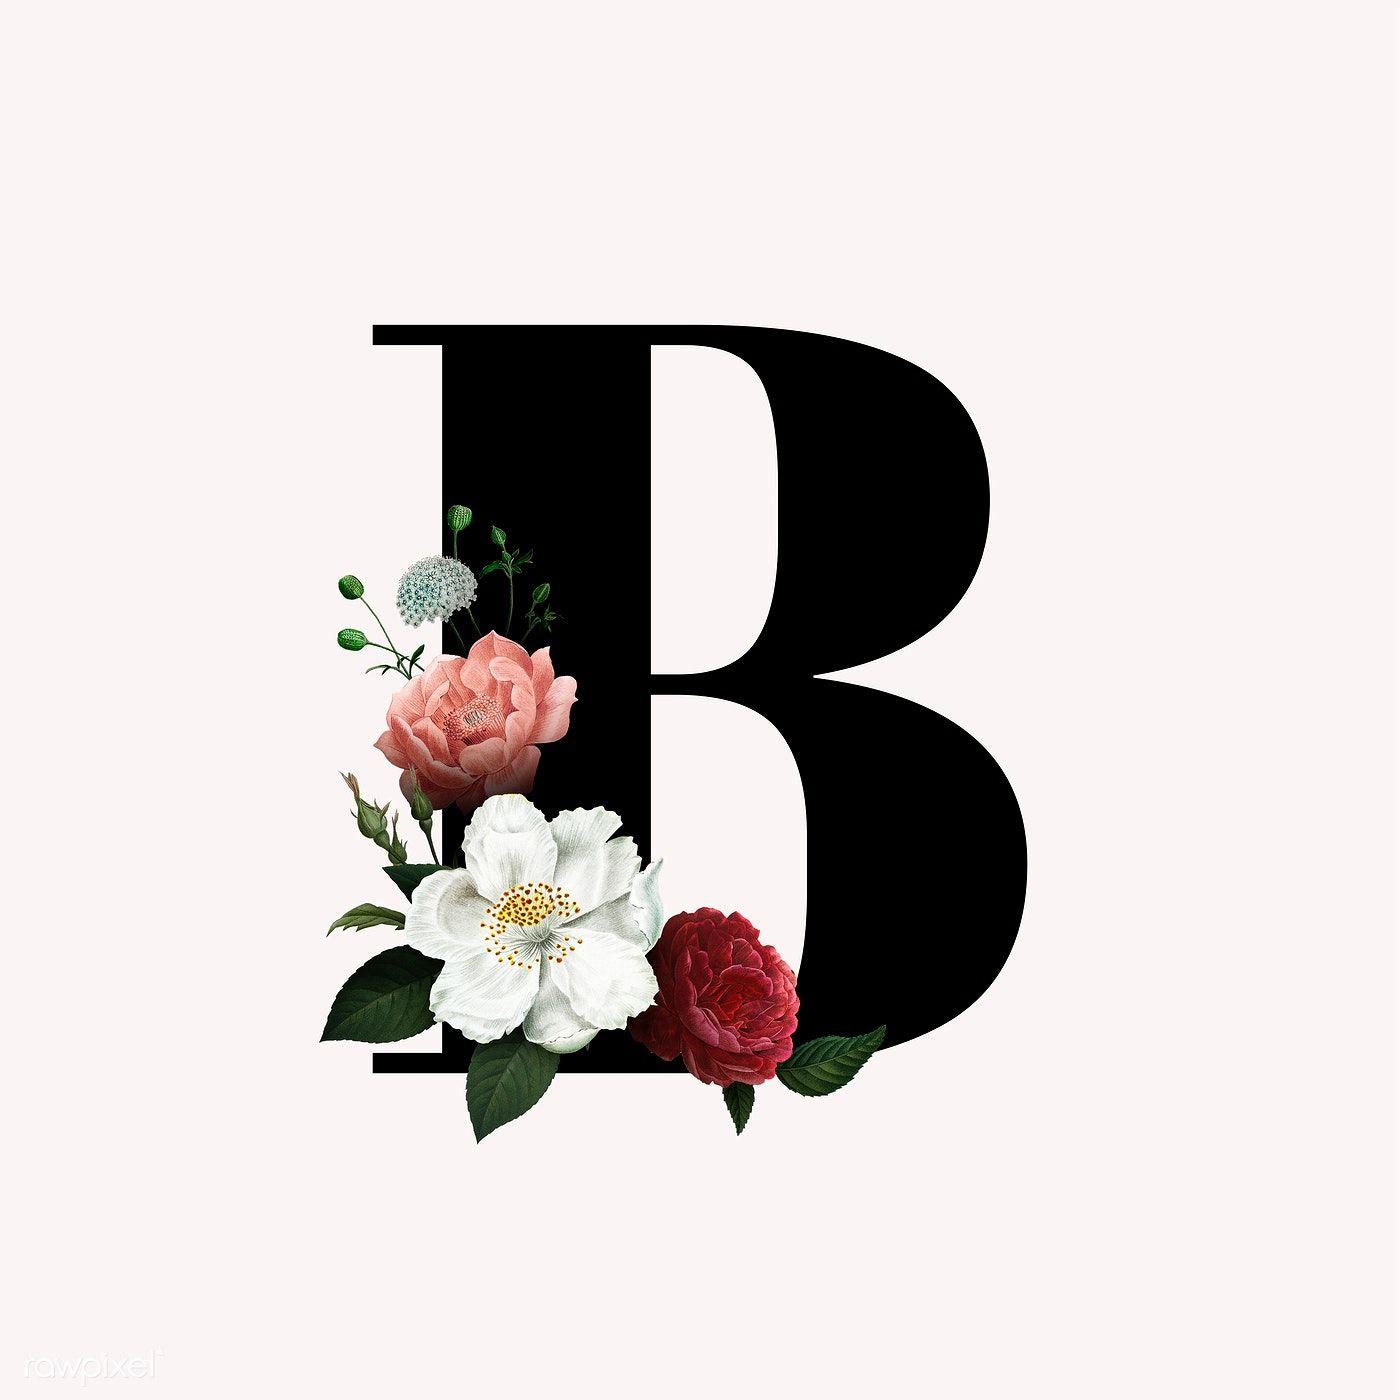 Classic And Elegant Floral Alphabet Font Letter B Free Image By Rawpixel Com Resim Duvari Balonlar Tablolar